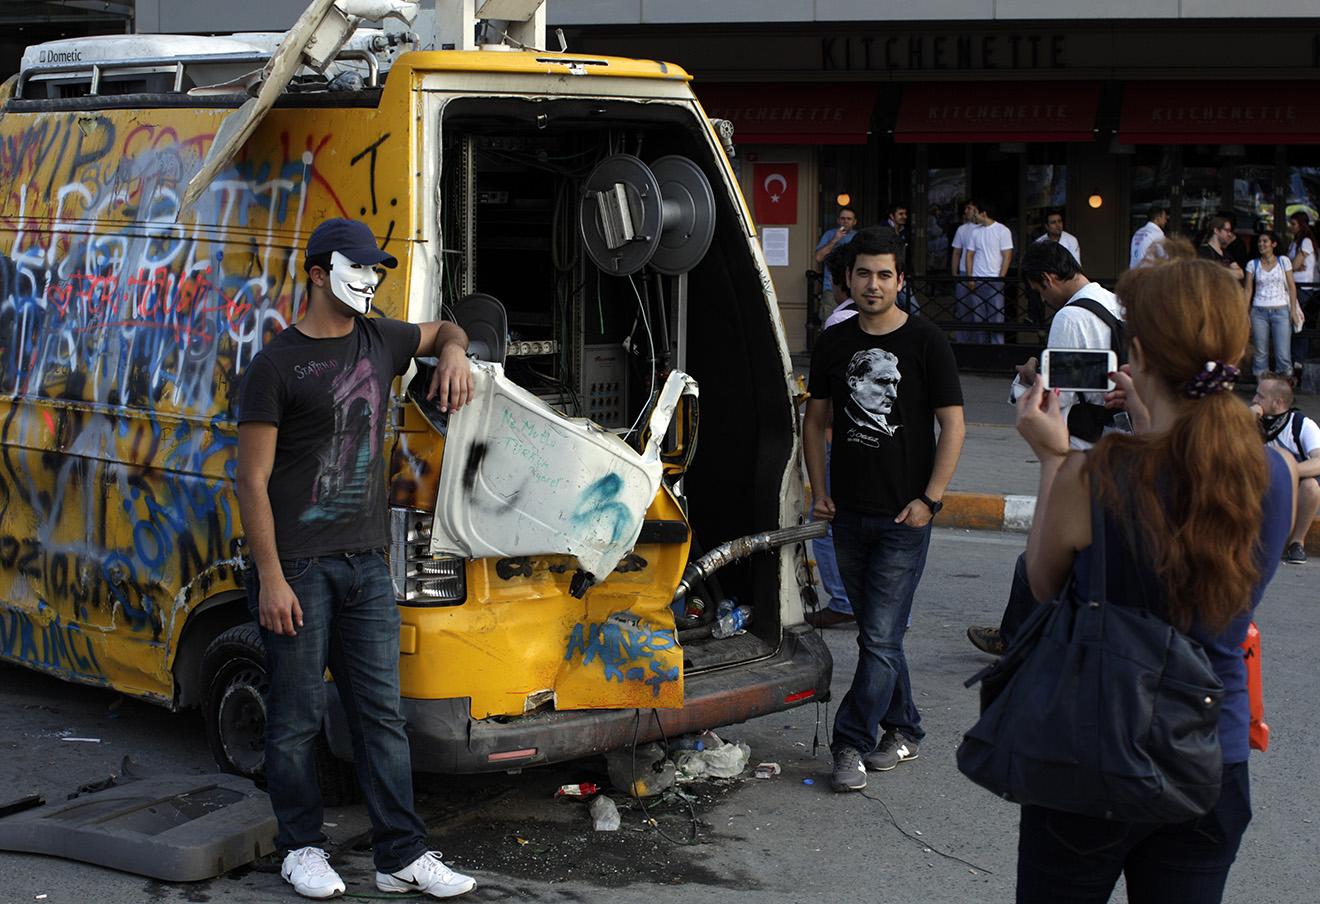 Протестующие позируют у разбитого телевизионного фургона на площади Таксим в Стамбуле, 2013 год.